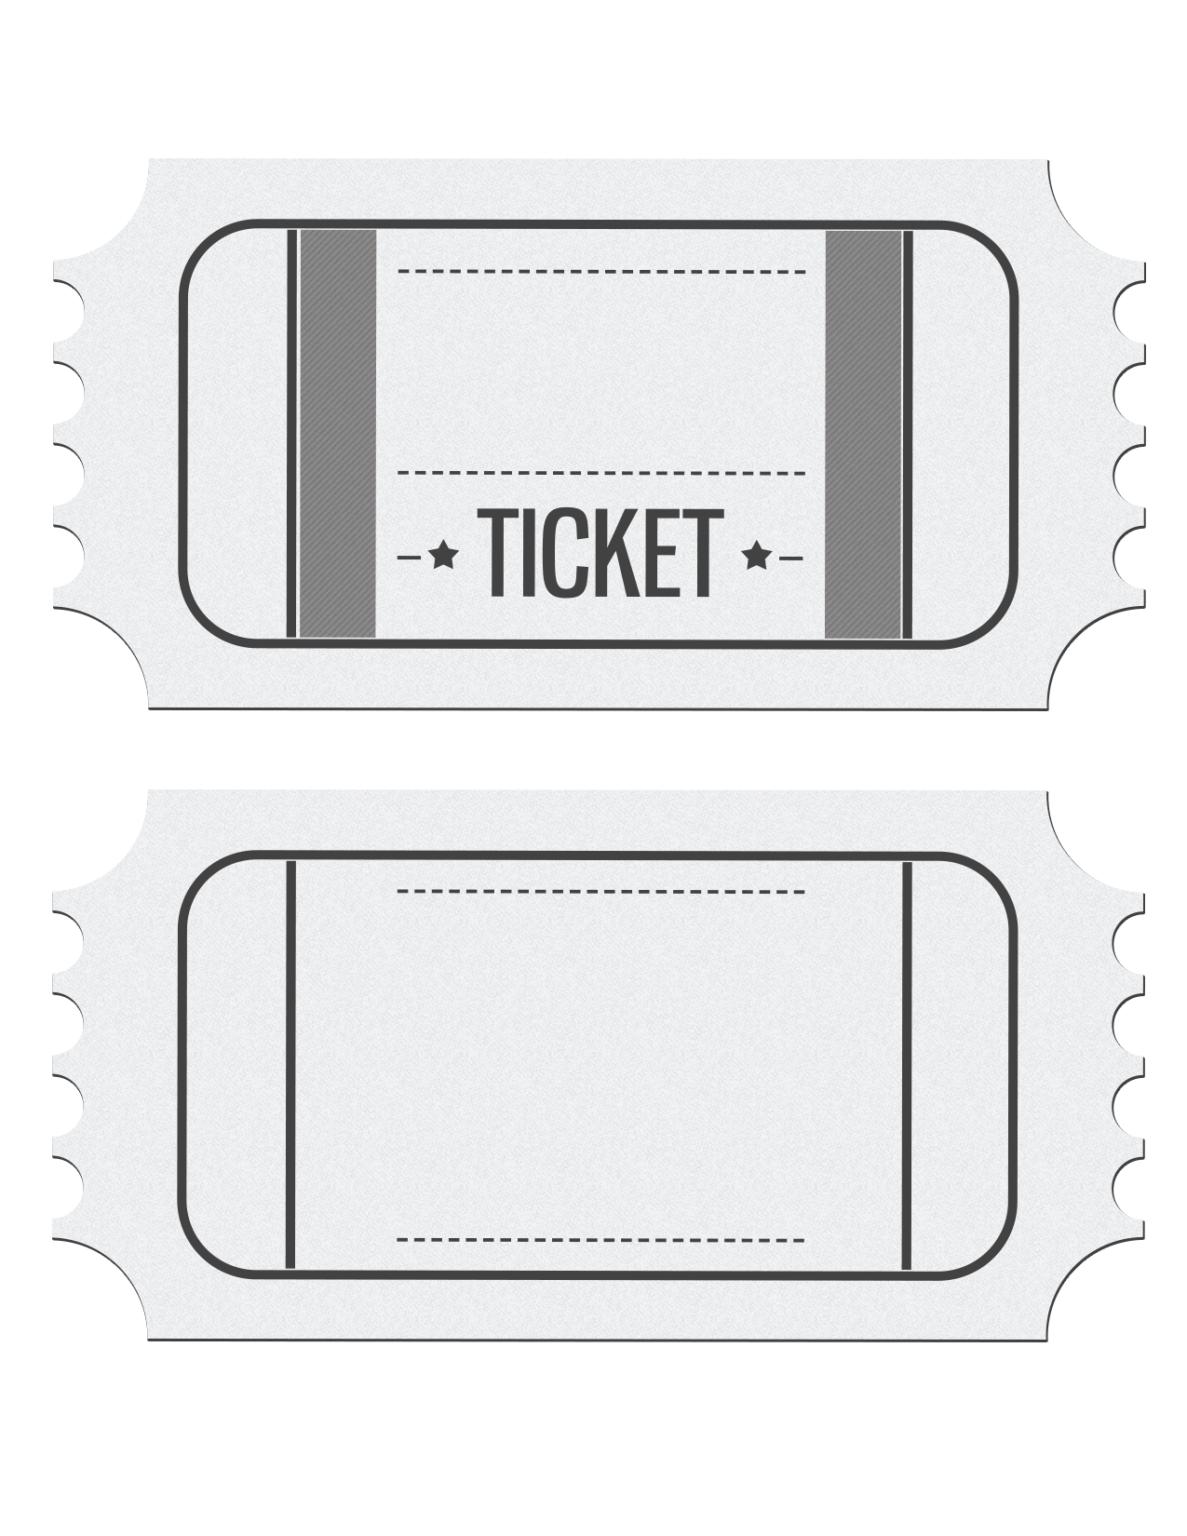 Blank Ticket Template Clipart Regarding Blank Admission Ticket Template Movie Ticket Invitations Movie Ticket Template Ticket Invitation